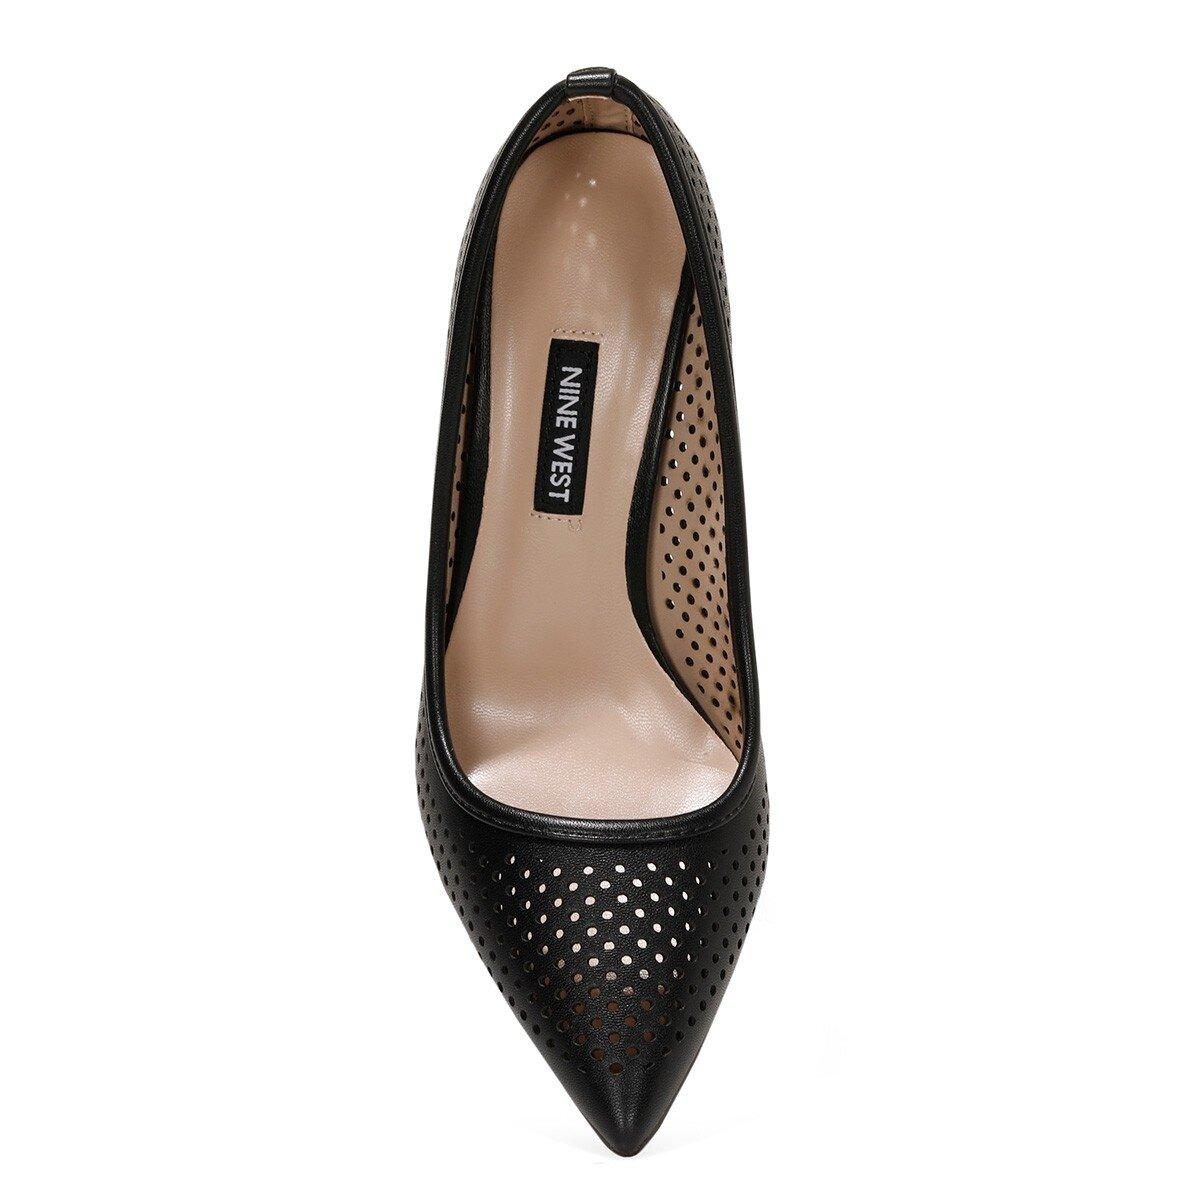 JERRIKA 1FX Siyah Kadın Topuklu Ayakkabı